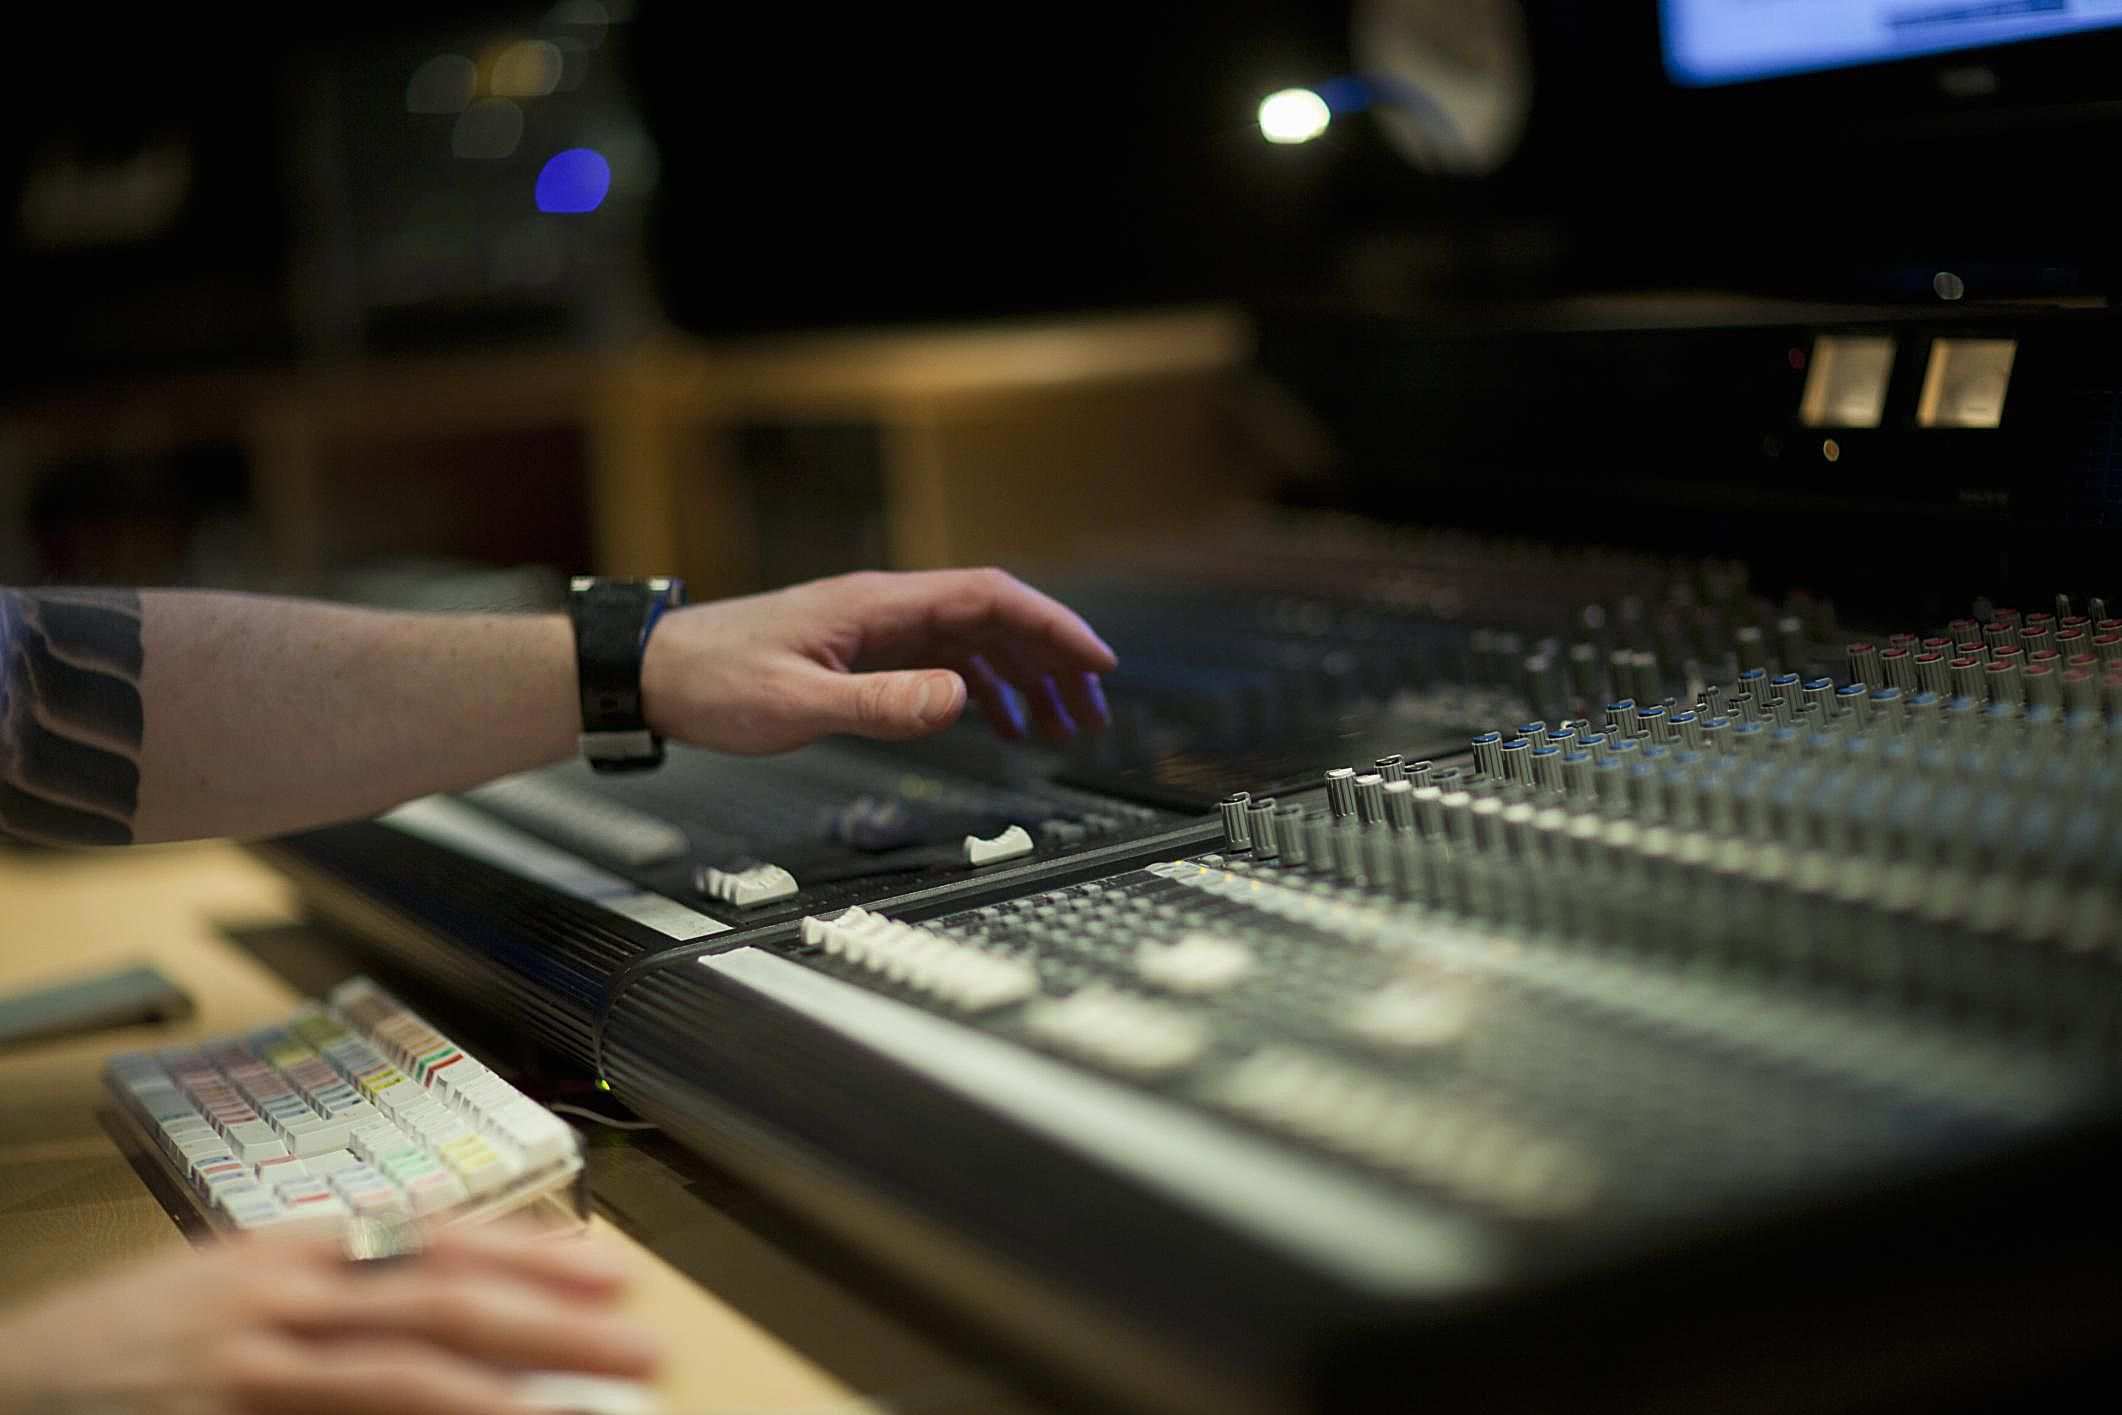 Audio Engineer Job Description Salary, Skills, & More